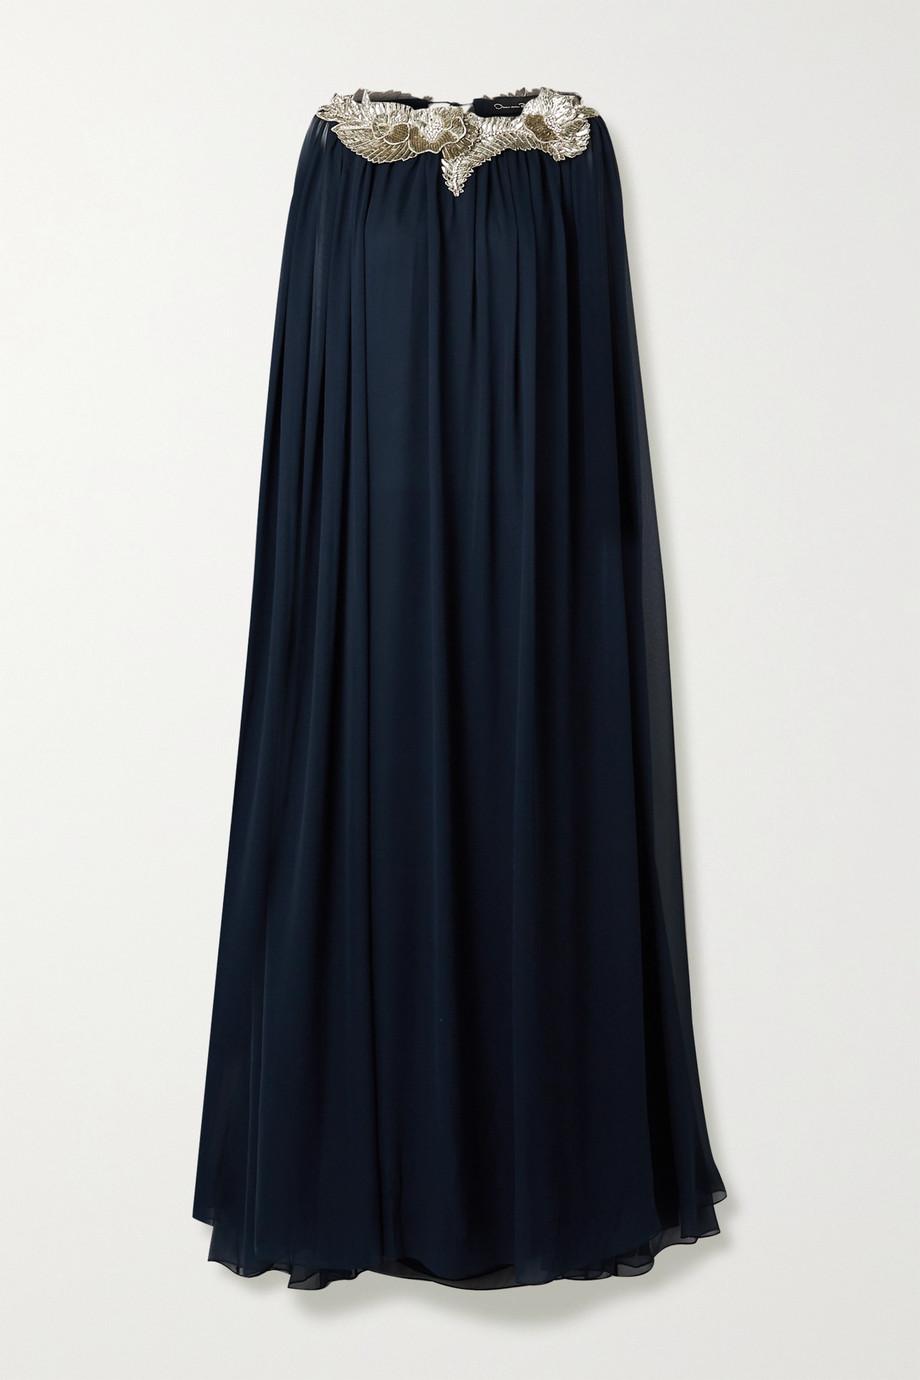 Oscar de la Renta | Cape-effect embellished silk-chiffon gown | NET-A-PORTER.COM